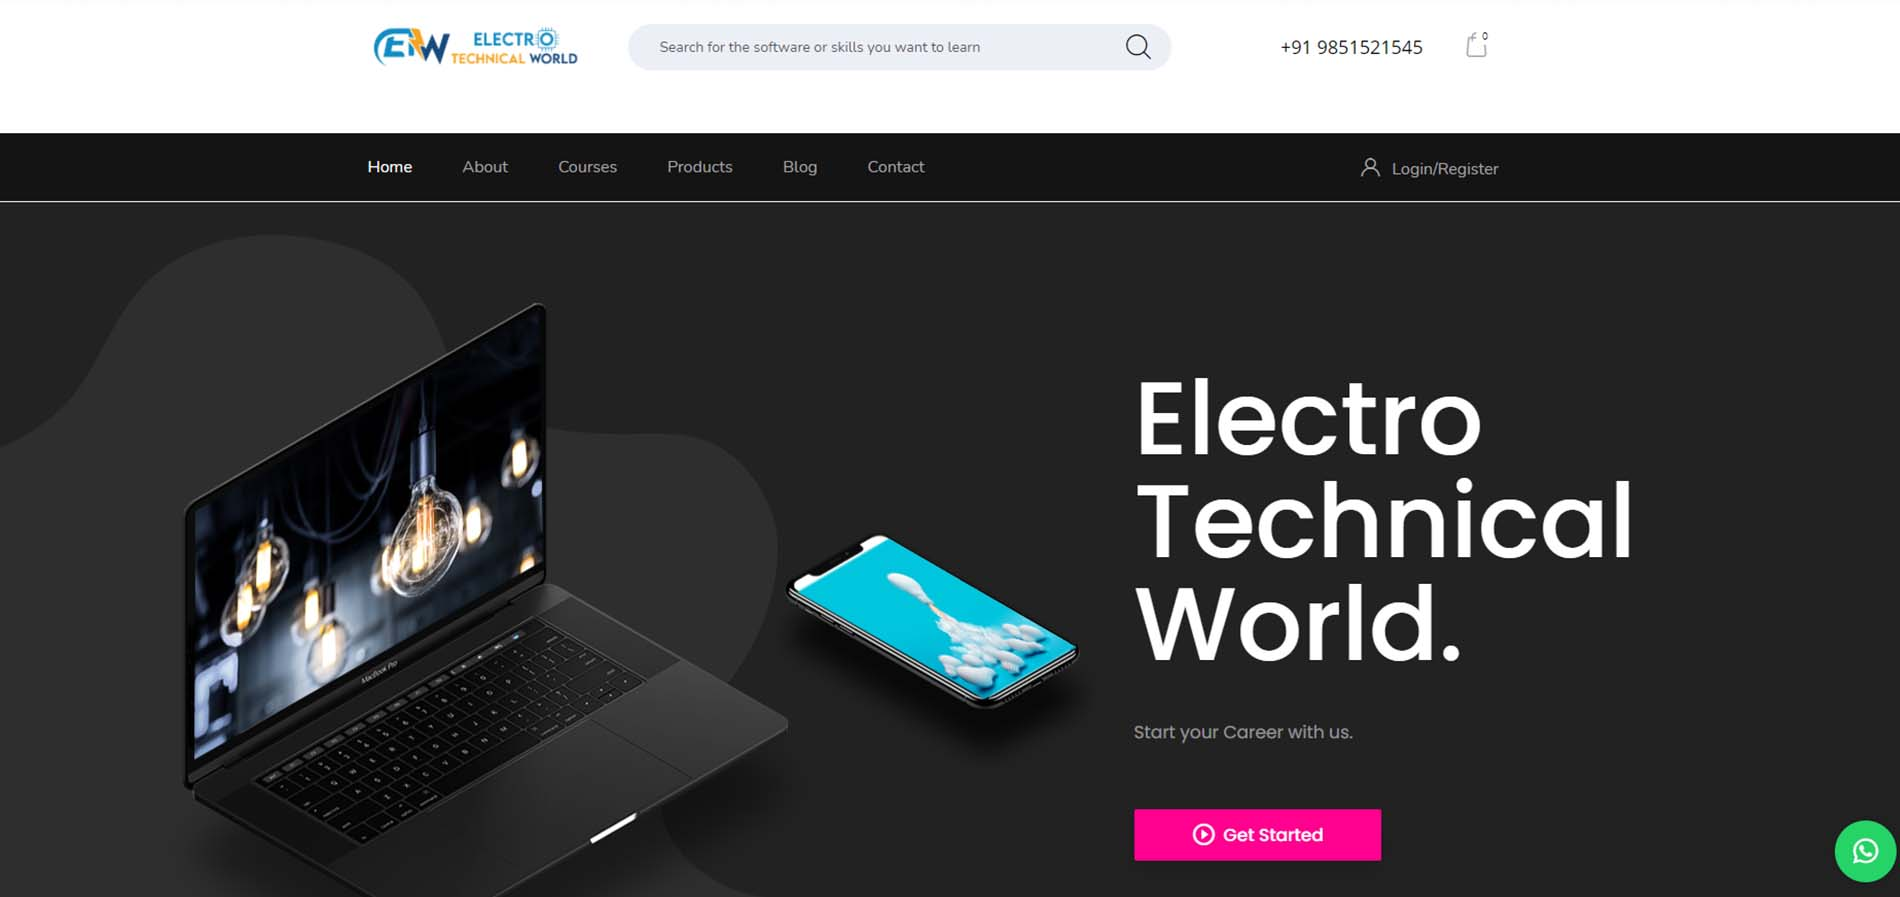 Electro Technical World